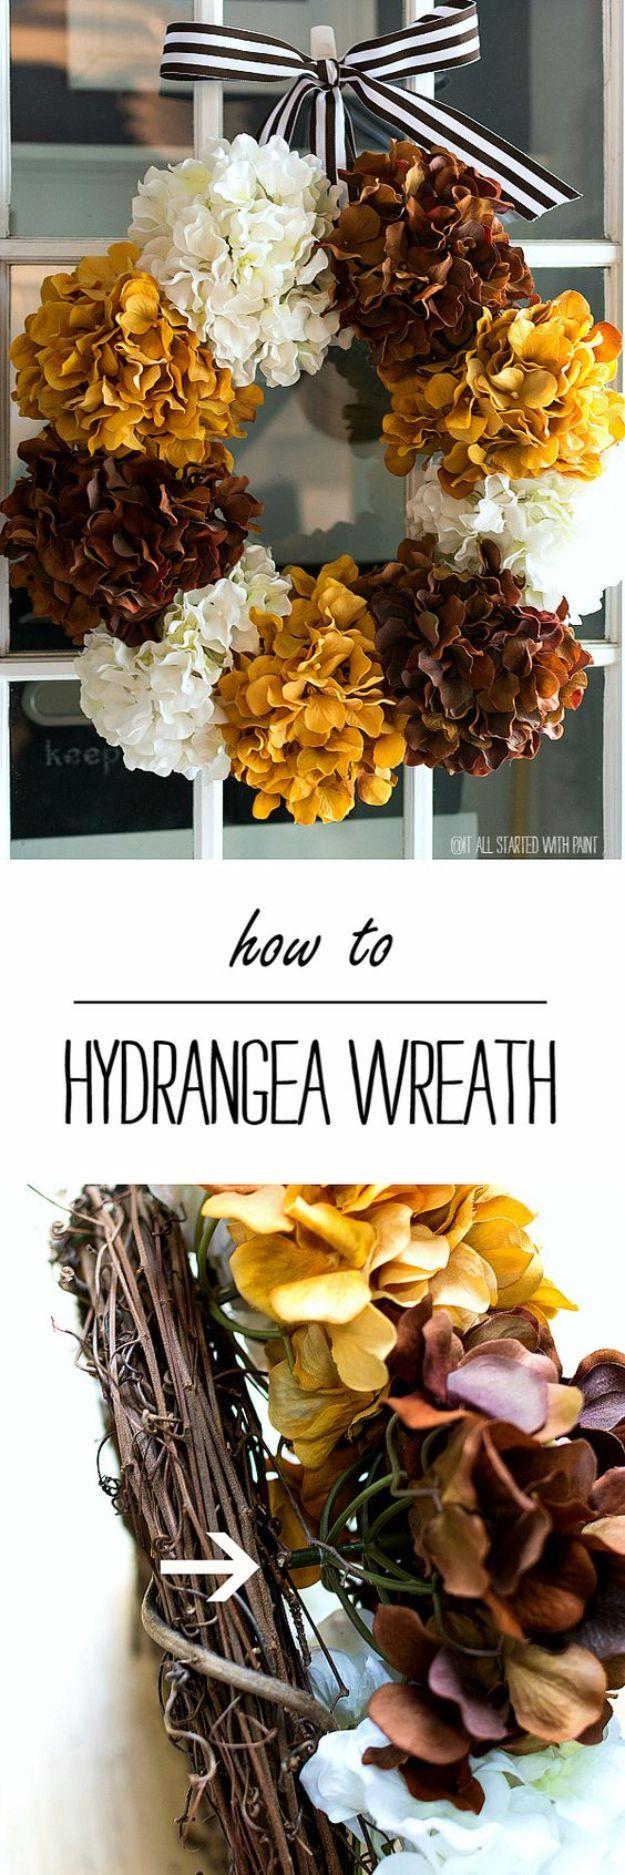 35 Fall Wreaths for Your Door - Hydrangea Wreath For Fall- Fall Wreaths For Front Door, Fall Wreaths Ideas To Try, Easy DIY Fall Wreaths, Brilliant Fall Wreath DIY, Porch Decor, Cool Ideas For Fall, Fall Projects http://diyjoy.com/fall-wreaths-door